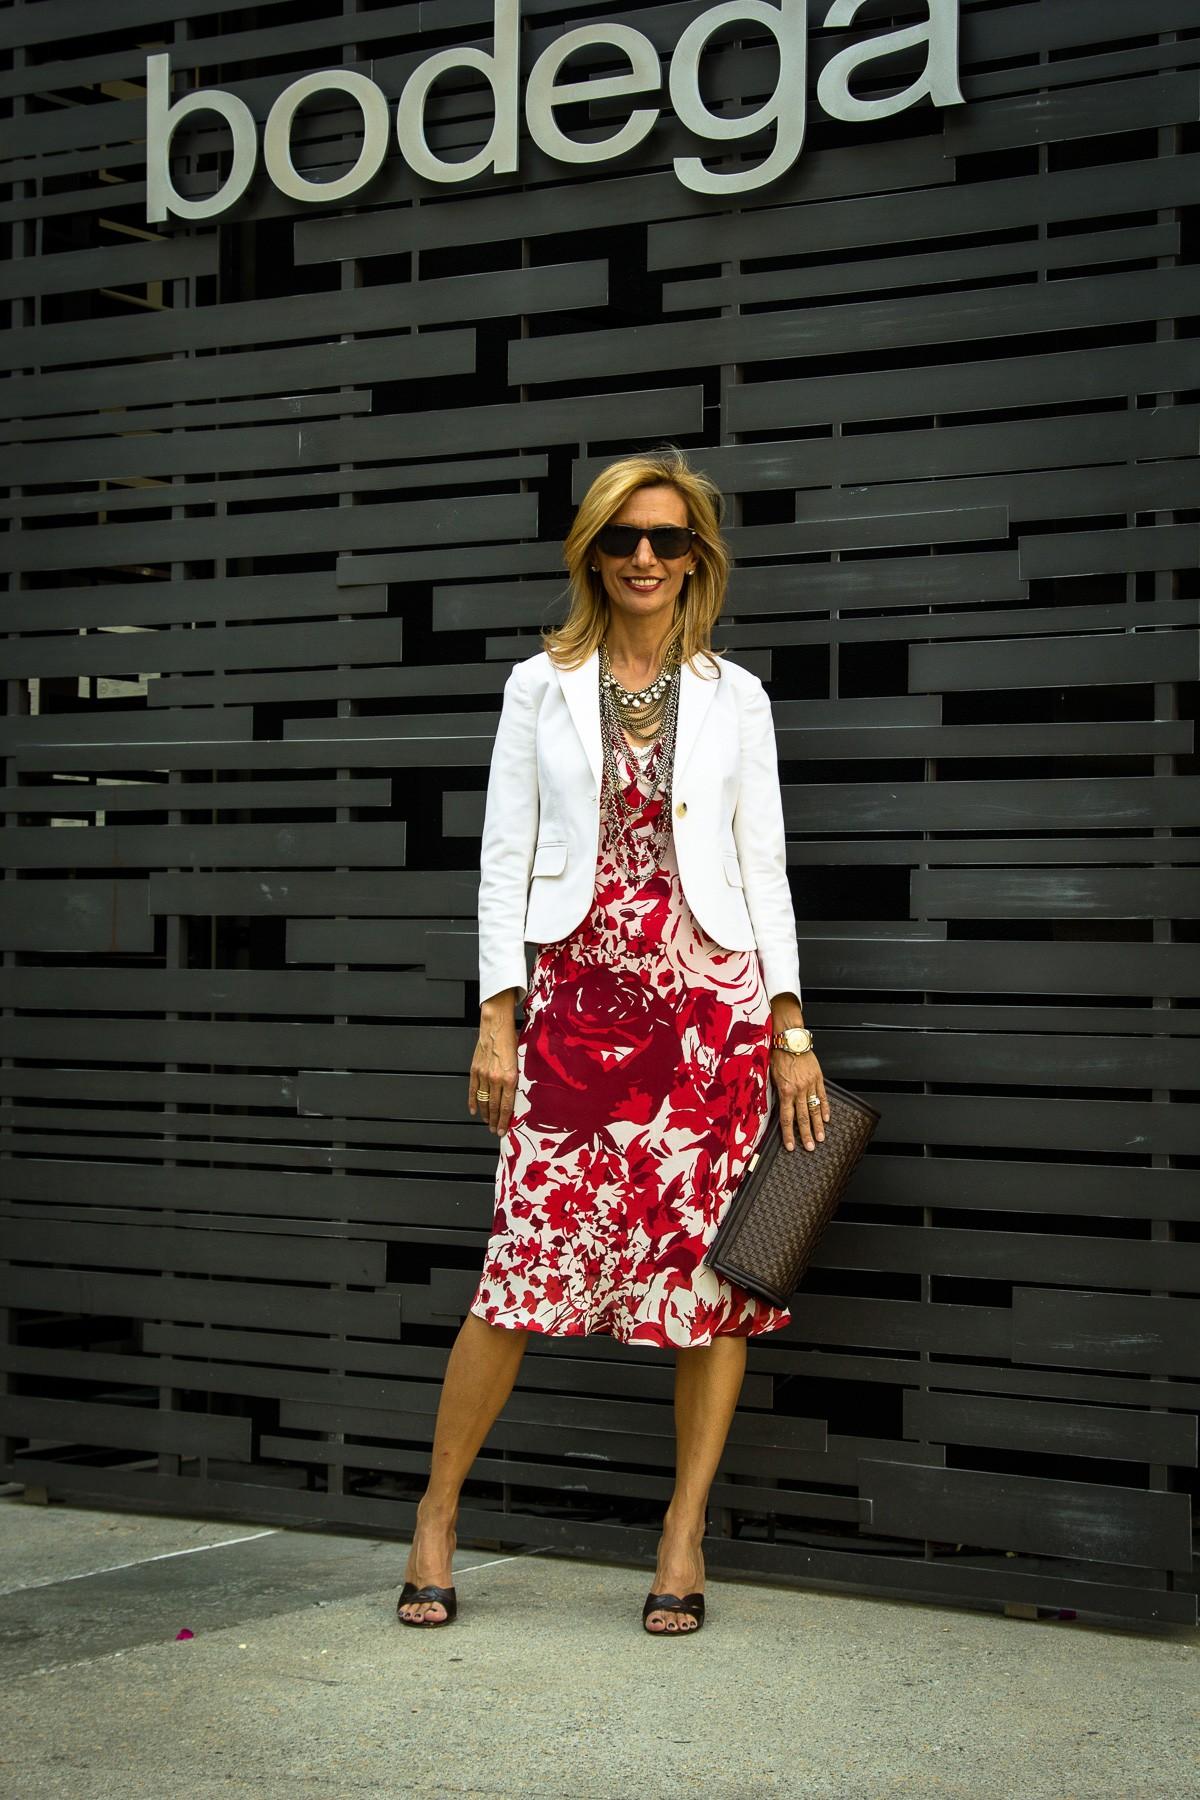 Wearing-My-Shrunken-Blazer-As-A-Cardigan-www.jacketsociety.com-6